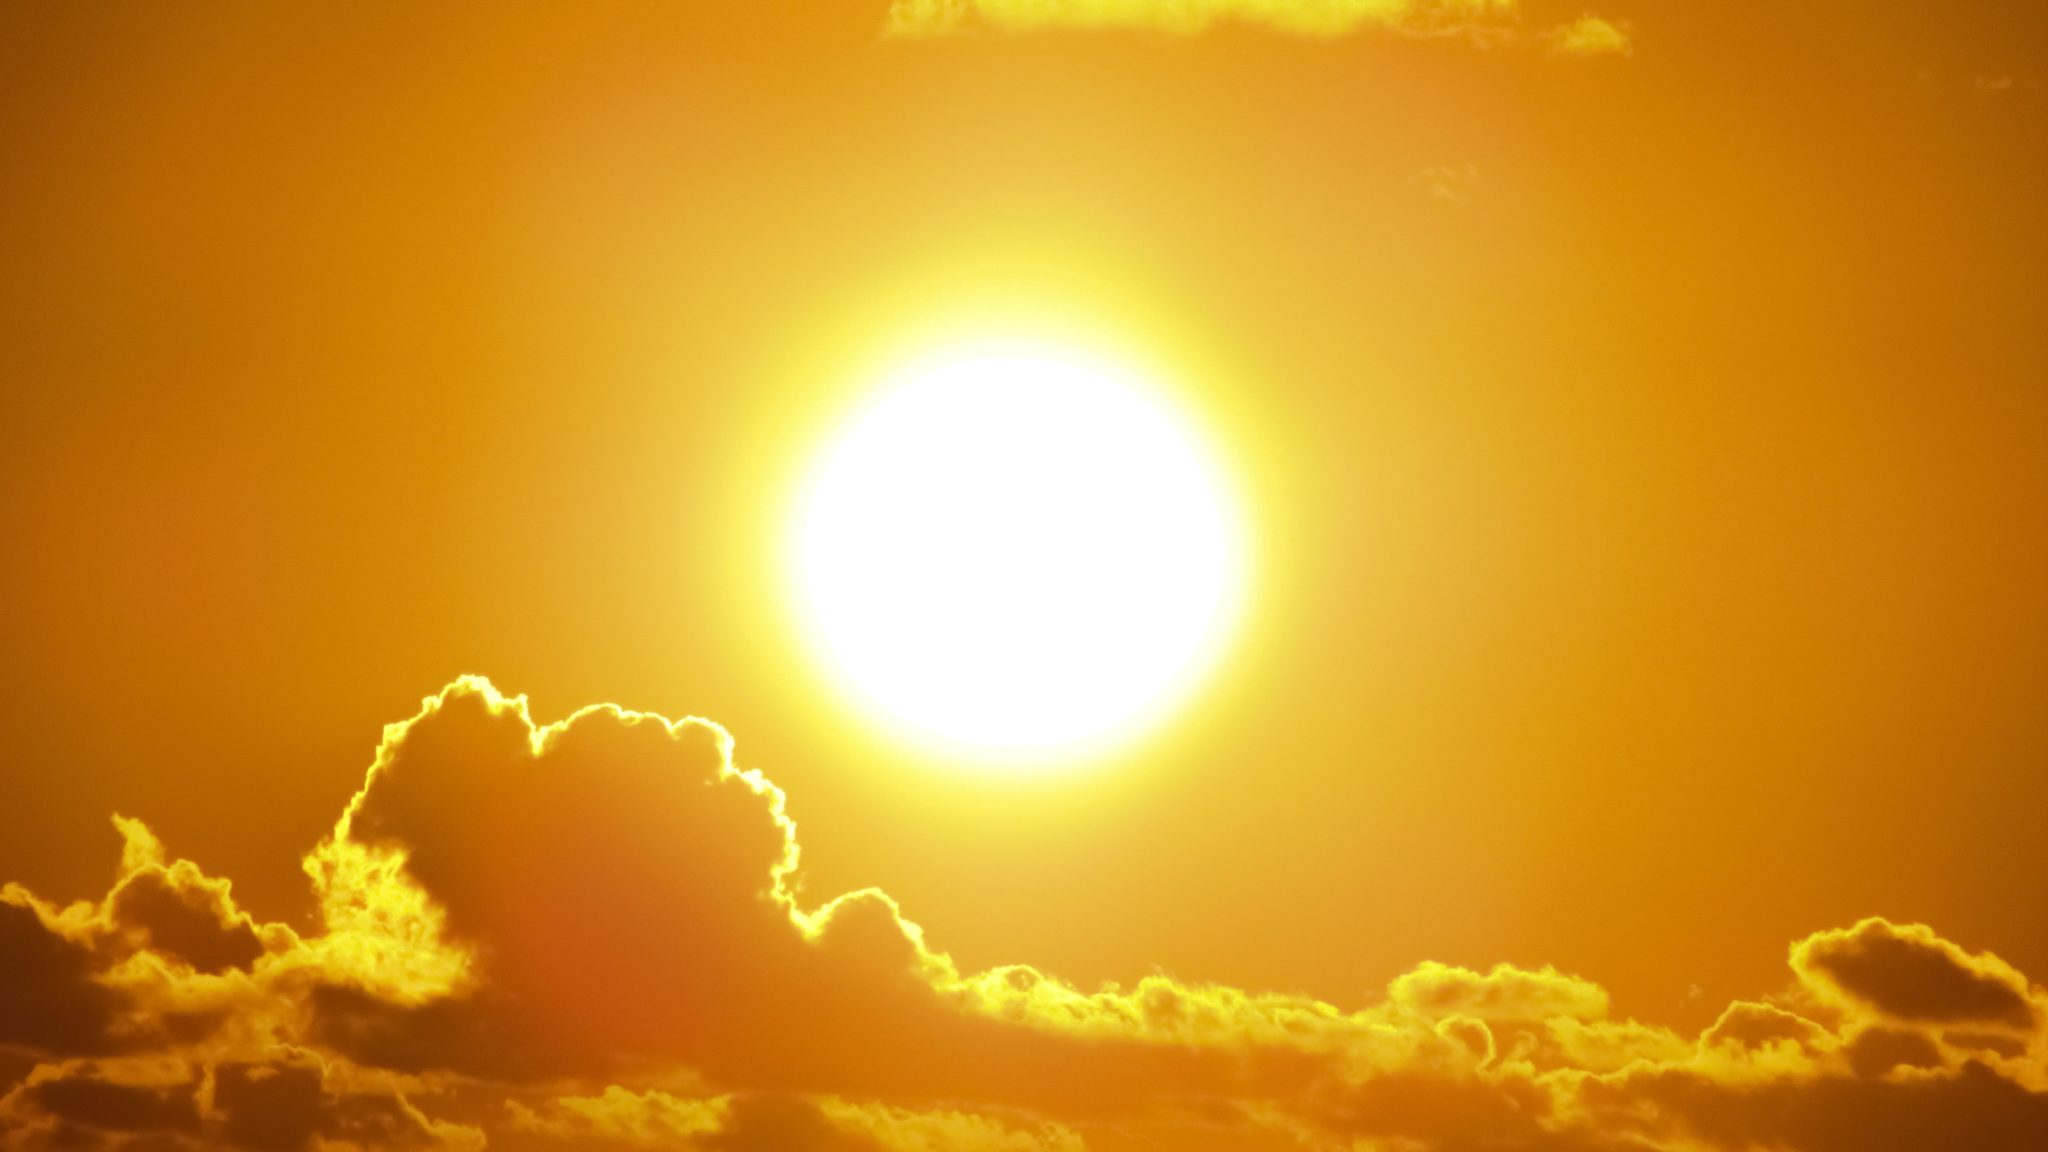 Bank Holiday Sunshine Breaks UK Solar Record